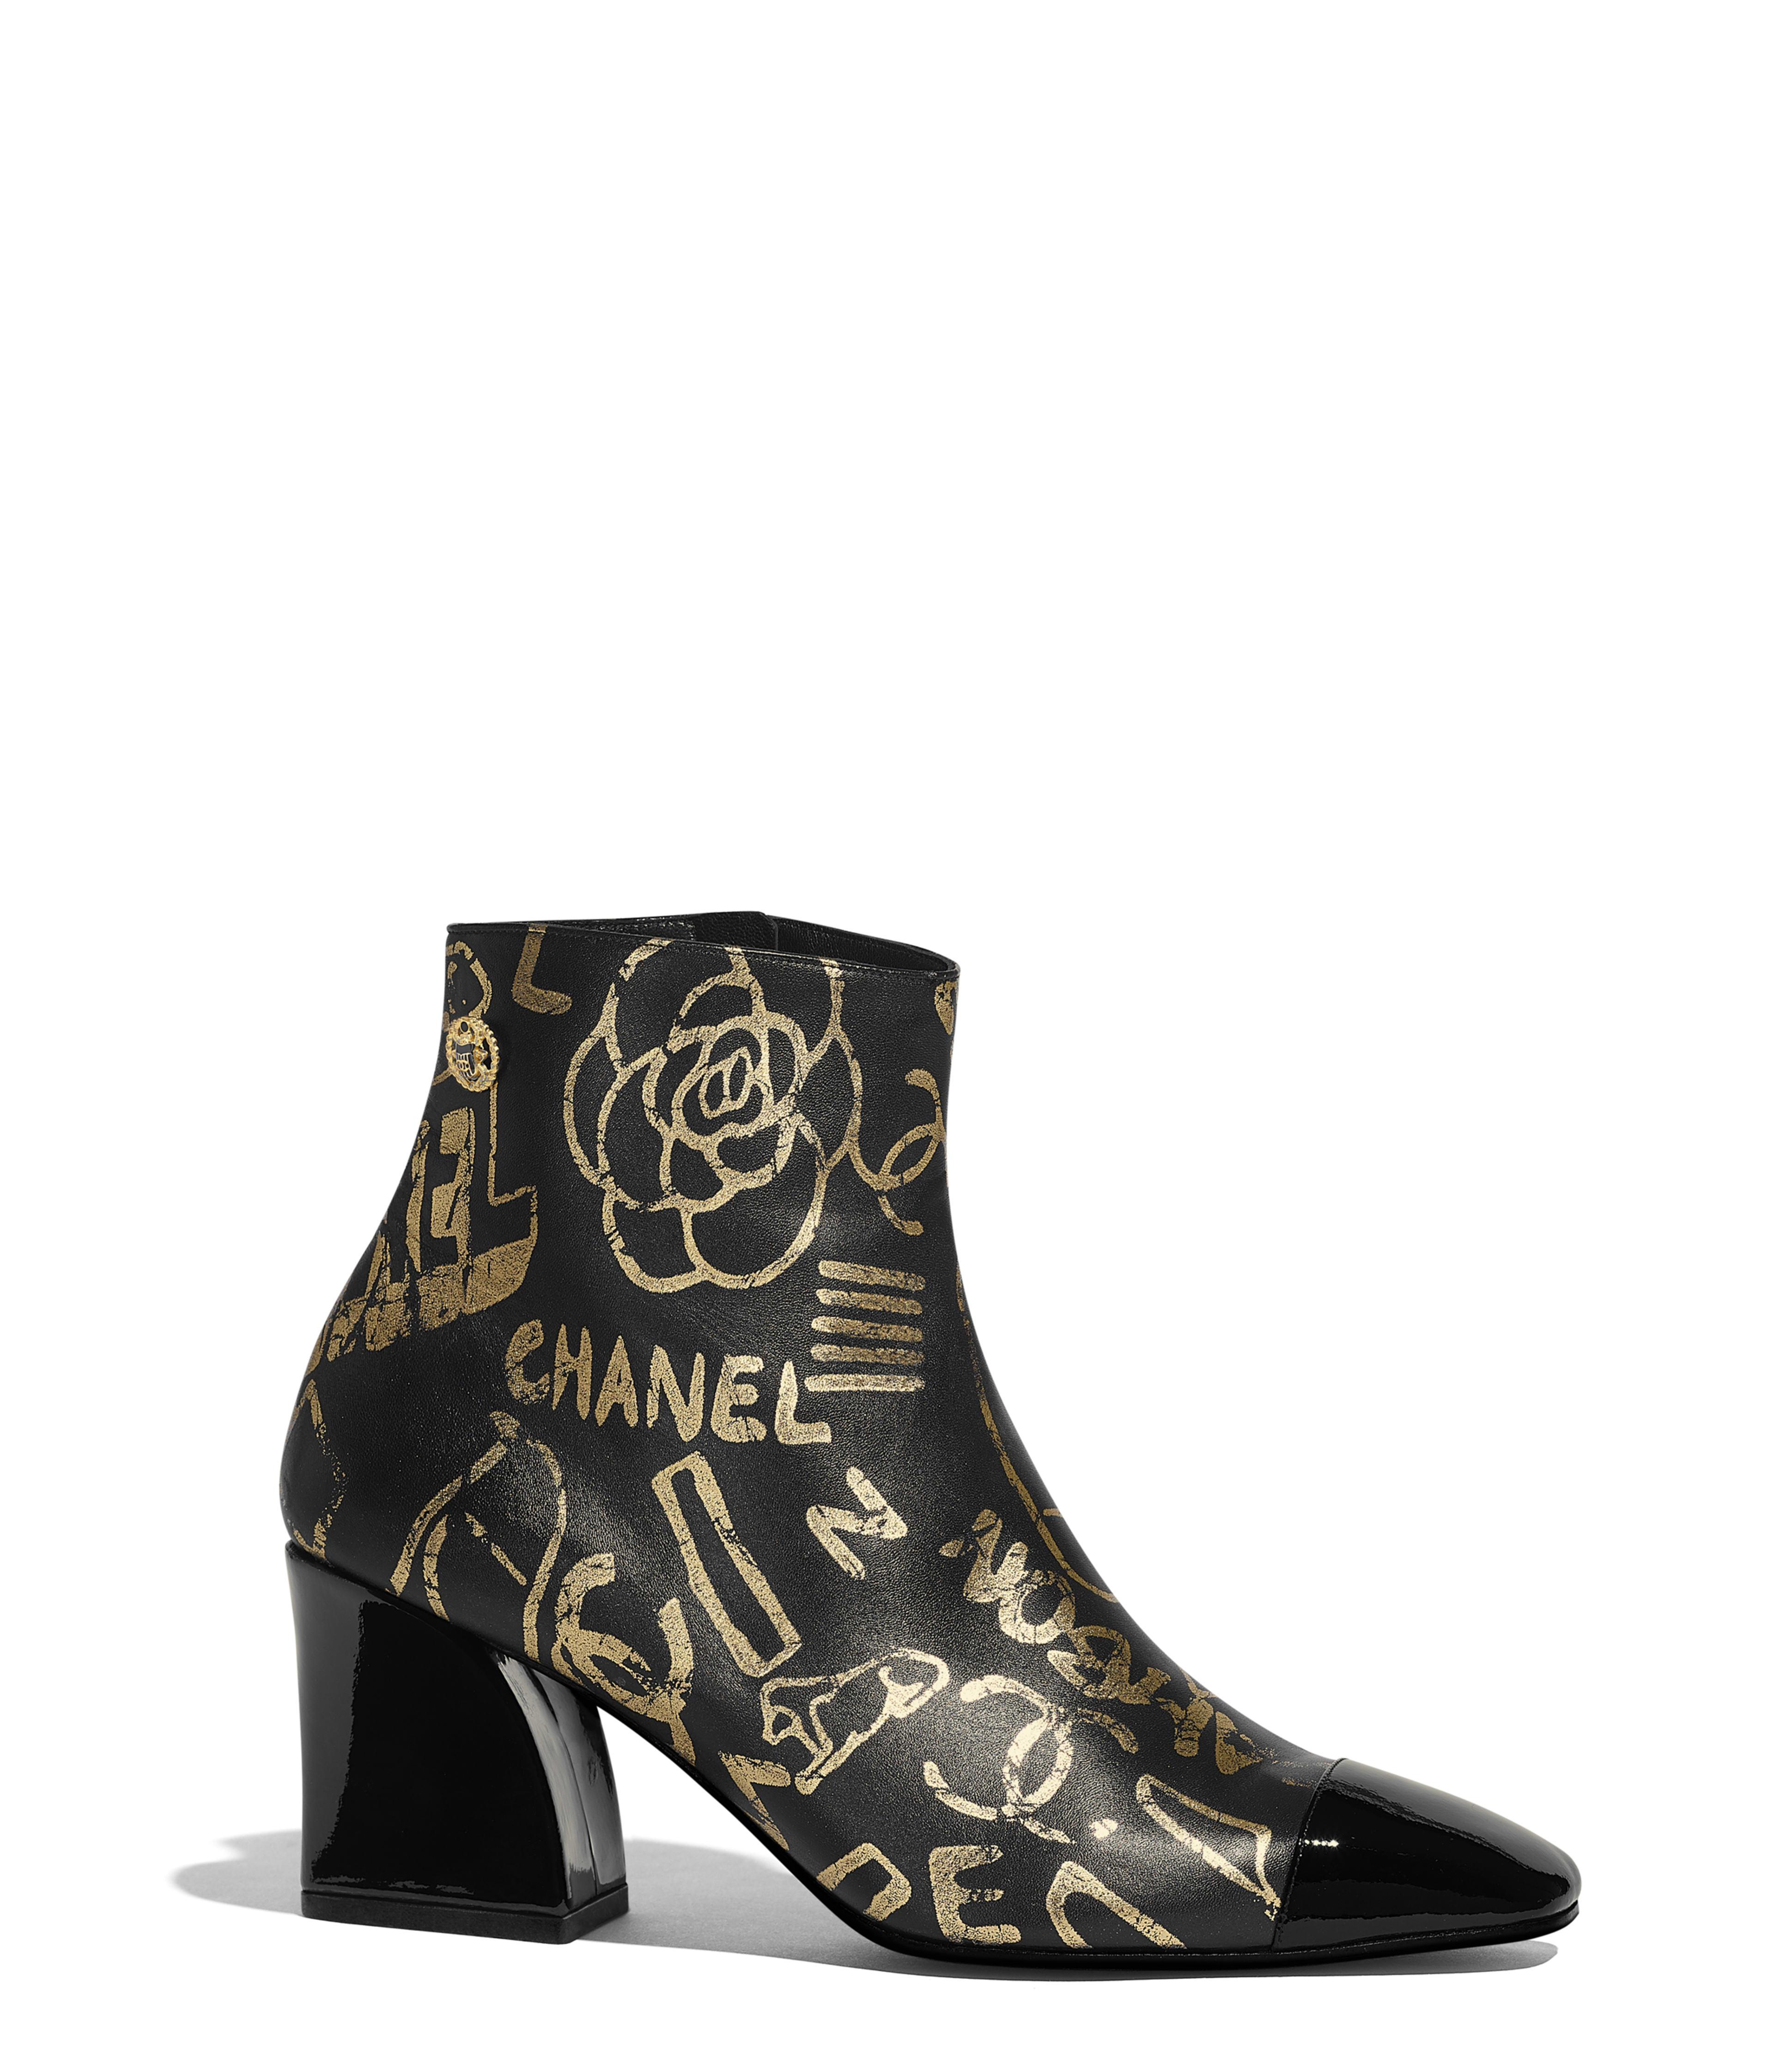 3cc92a12c47266 Short Boots Printed Lambskin & Patent Calfskin, Gold & Black Ref.  G35073Y53384C0369